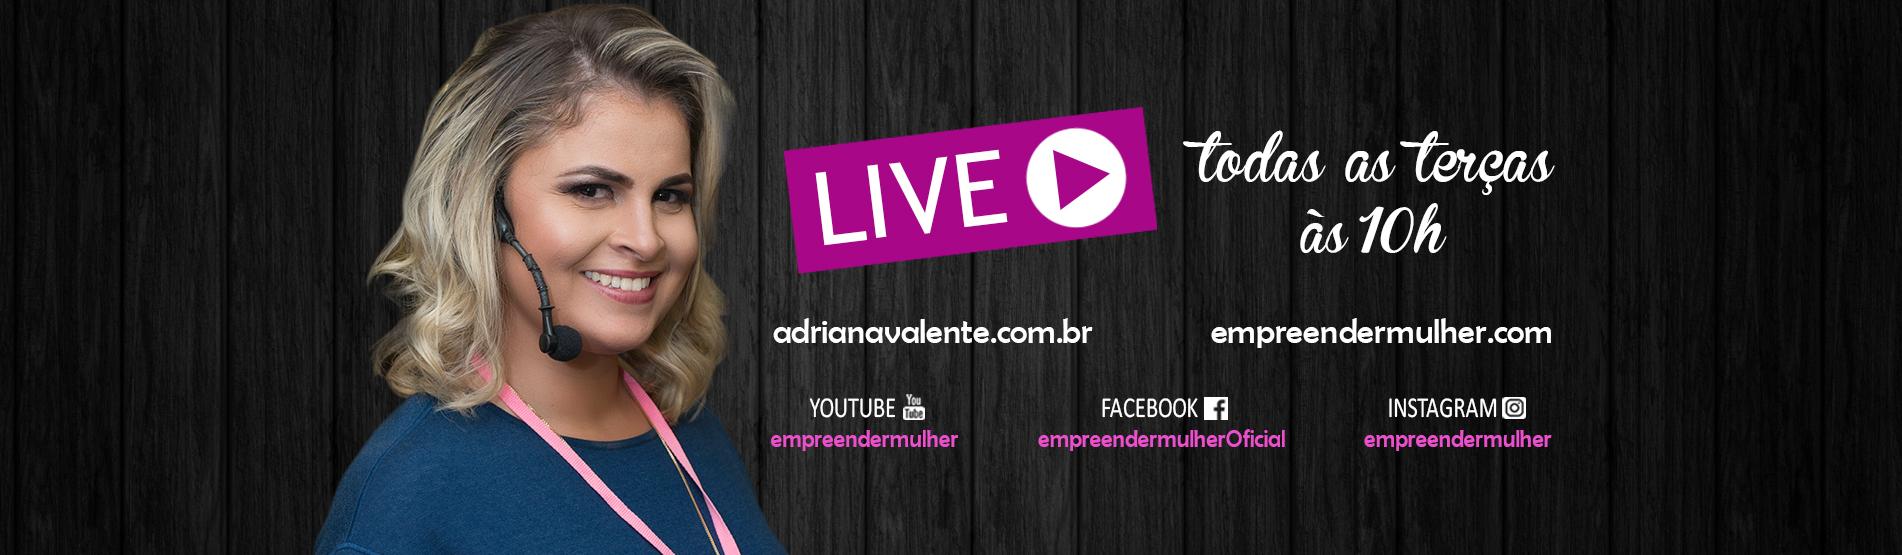 Empreender Mulher - Adriana Valente